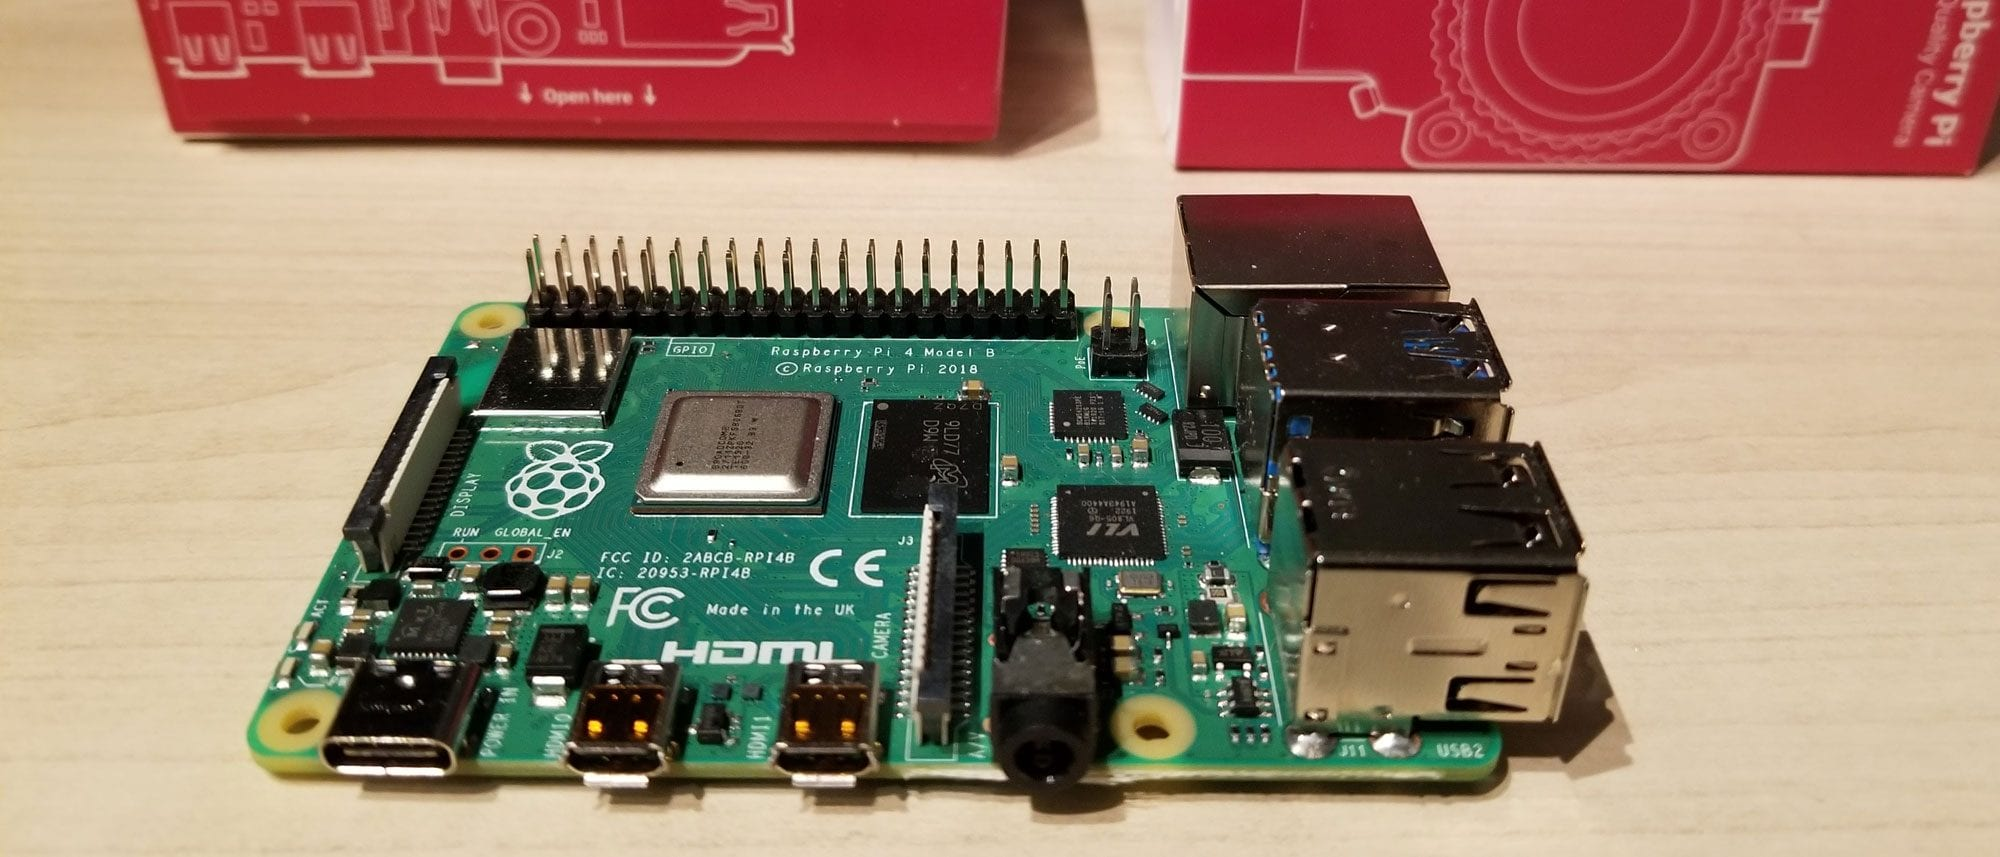 Raspberry Pi تطلق إصدار جديد من Raspberry Pi 4 بذاكرة تصل إلى 8 جيجابايت رام